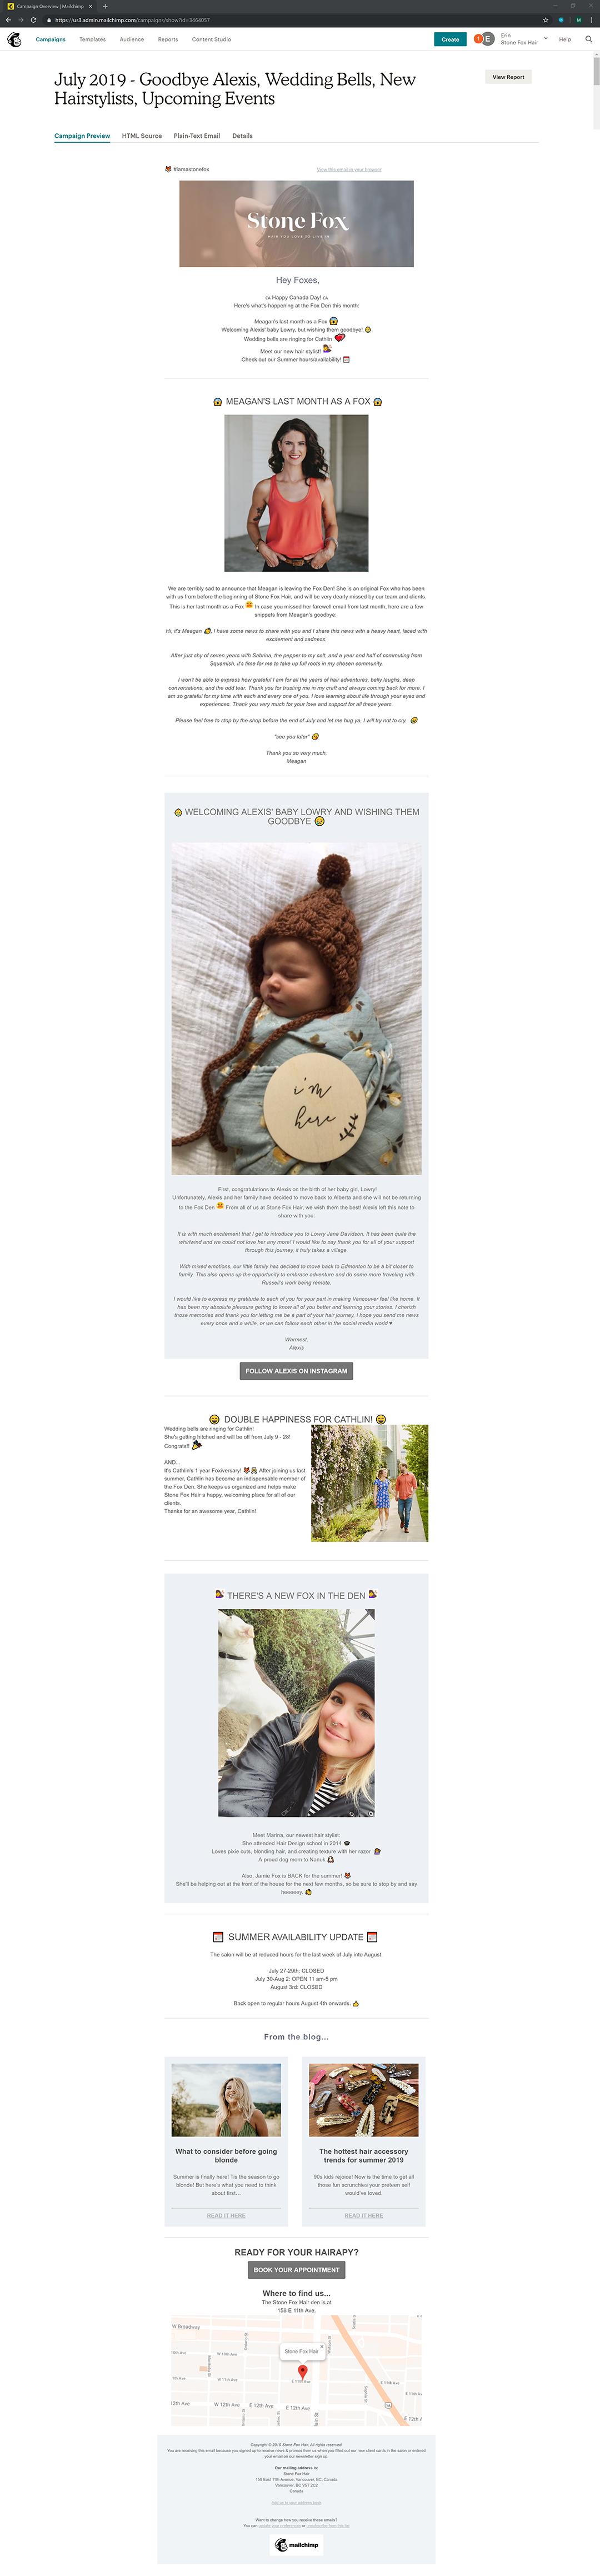 Wedding Bells containers Stone Fox Hair Studio Newsletter Mailchimps Vancouver created with Legendary Social Media created by Feifei Digital Ltd | Monika Szucs